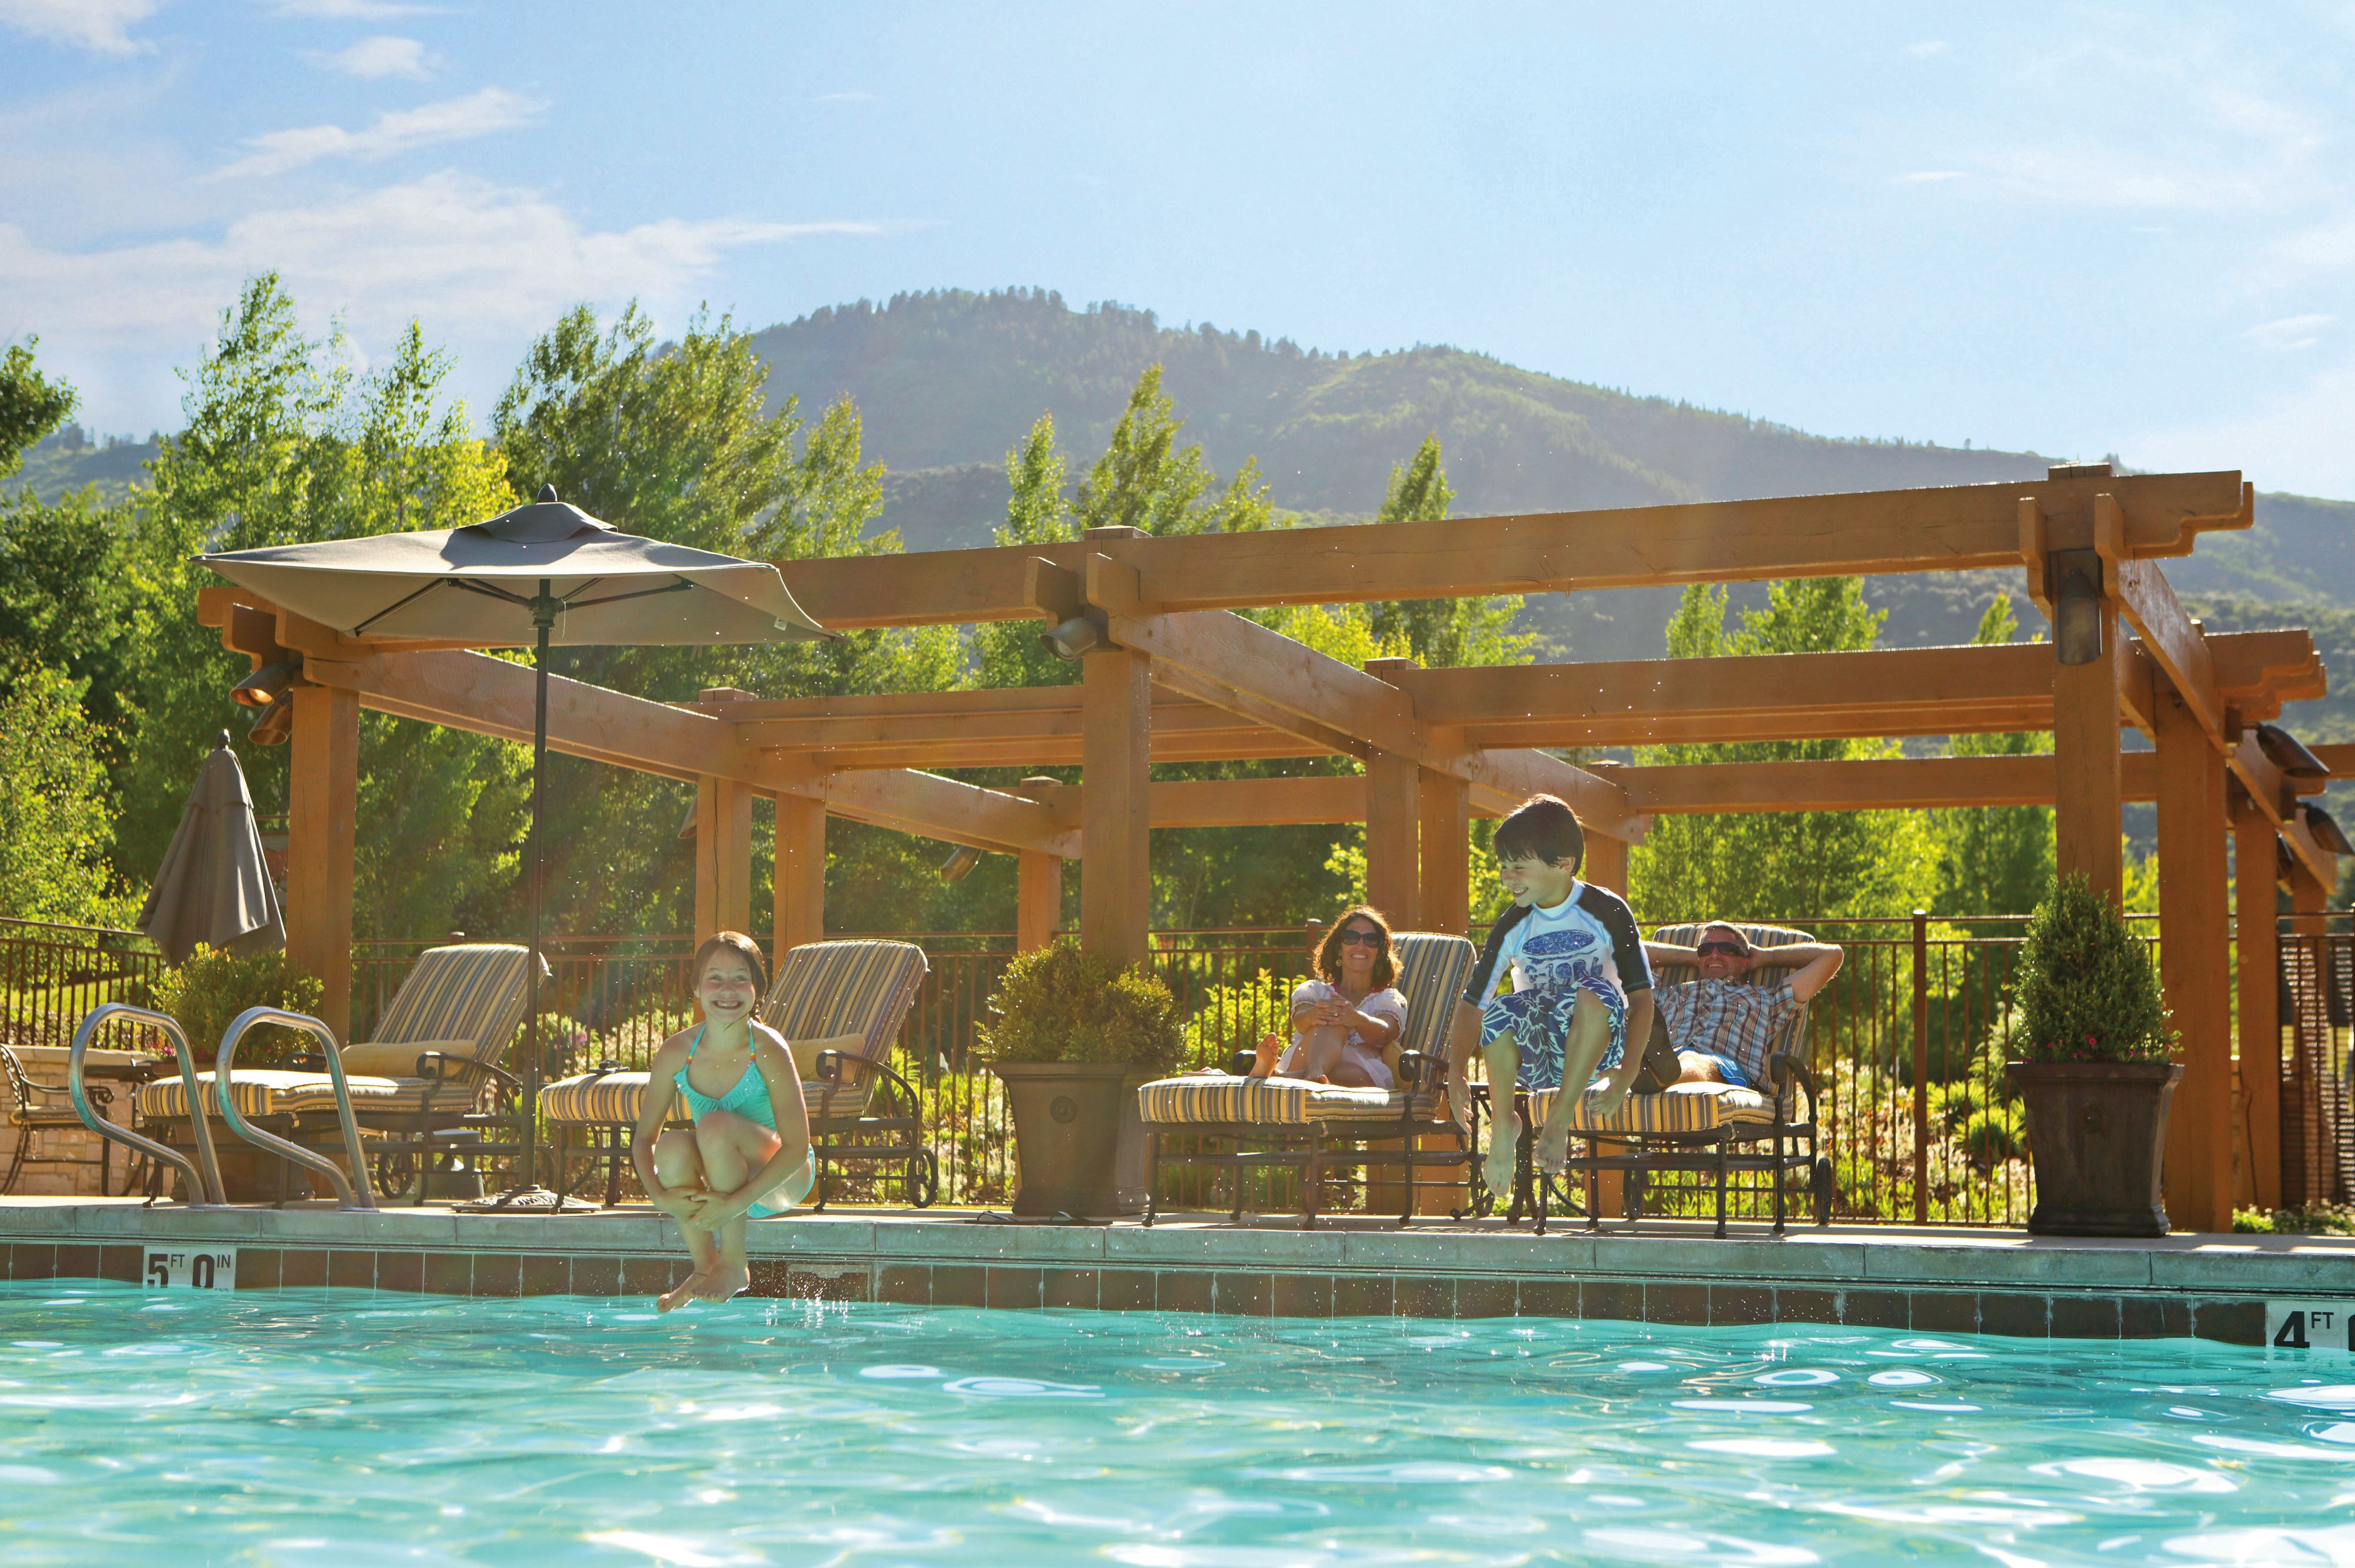 Family pool time master yrk9fp